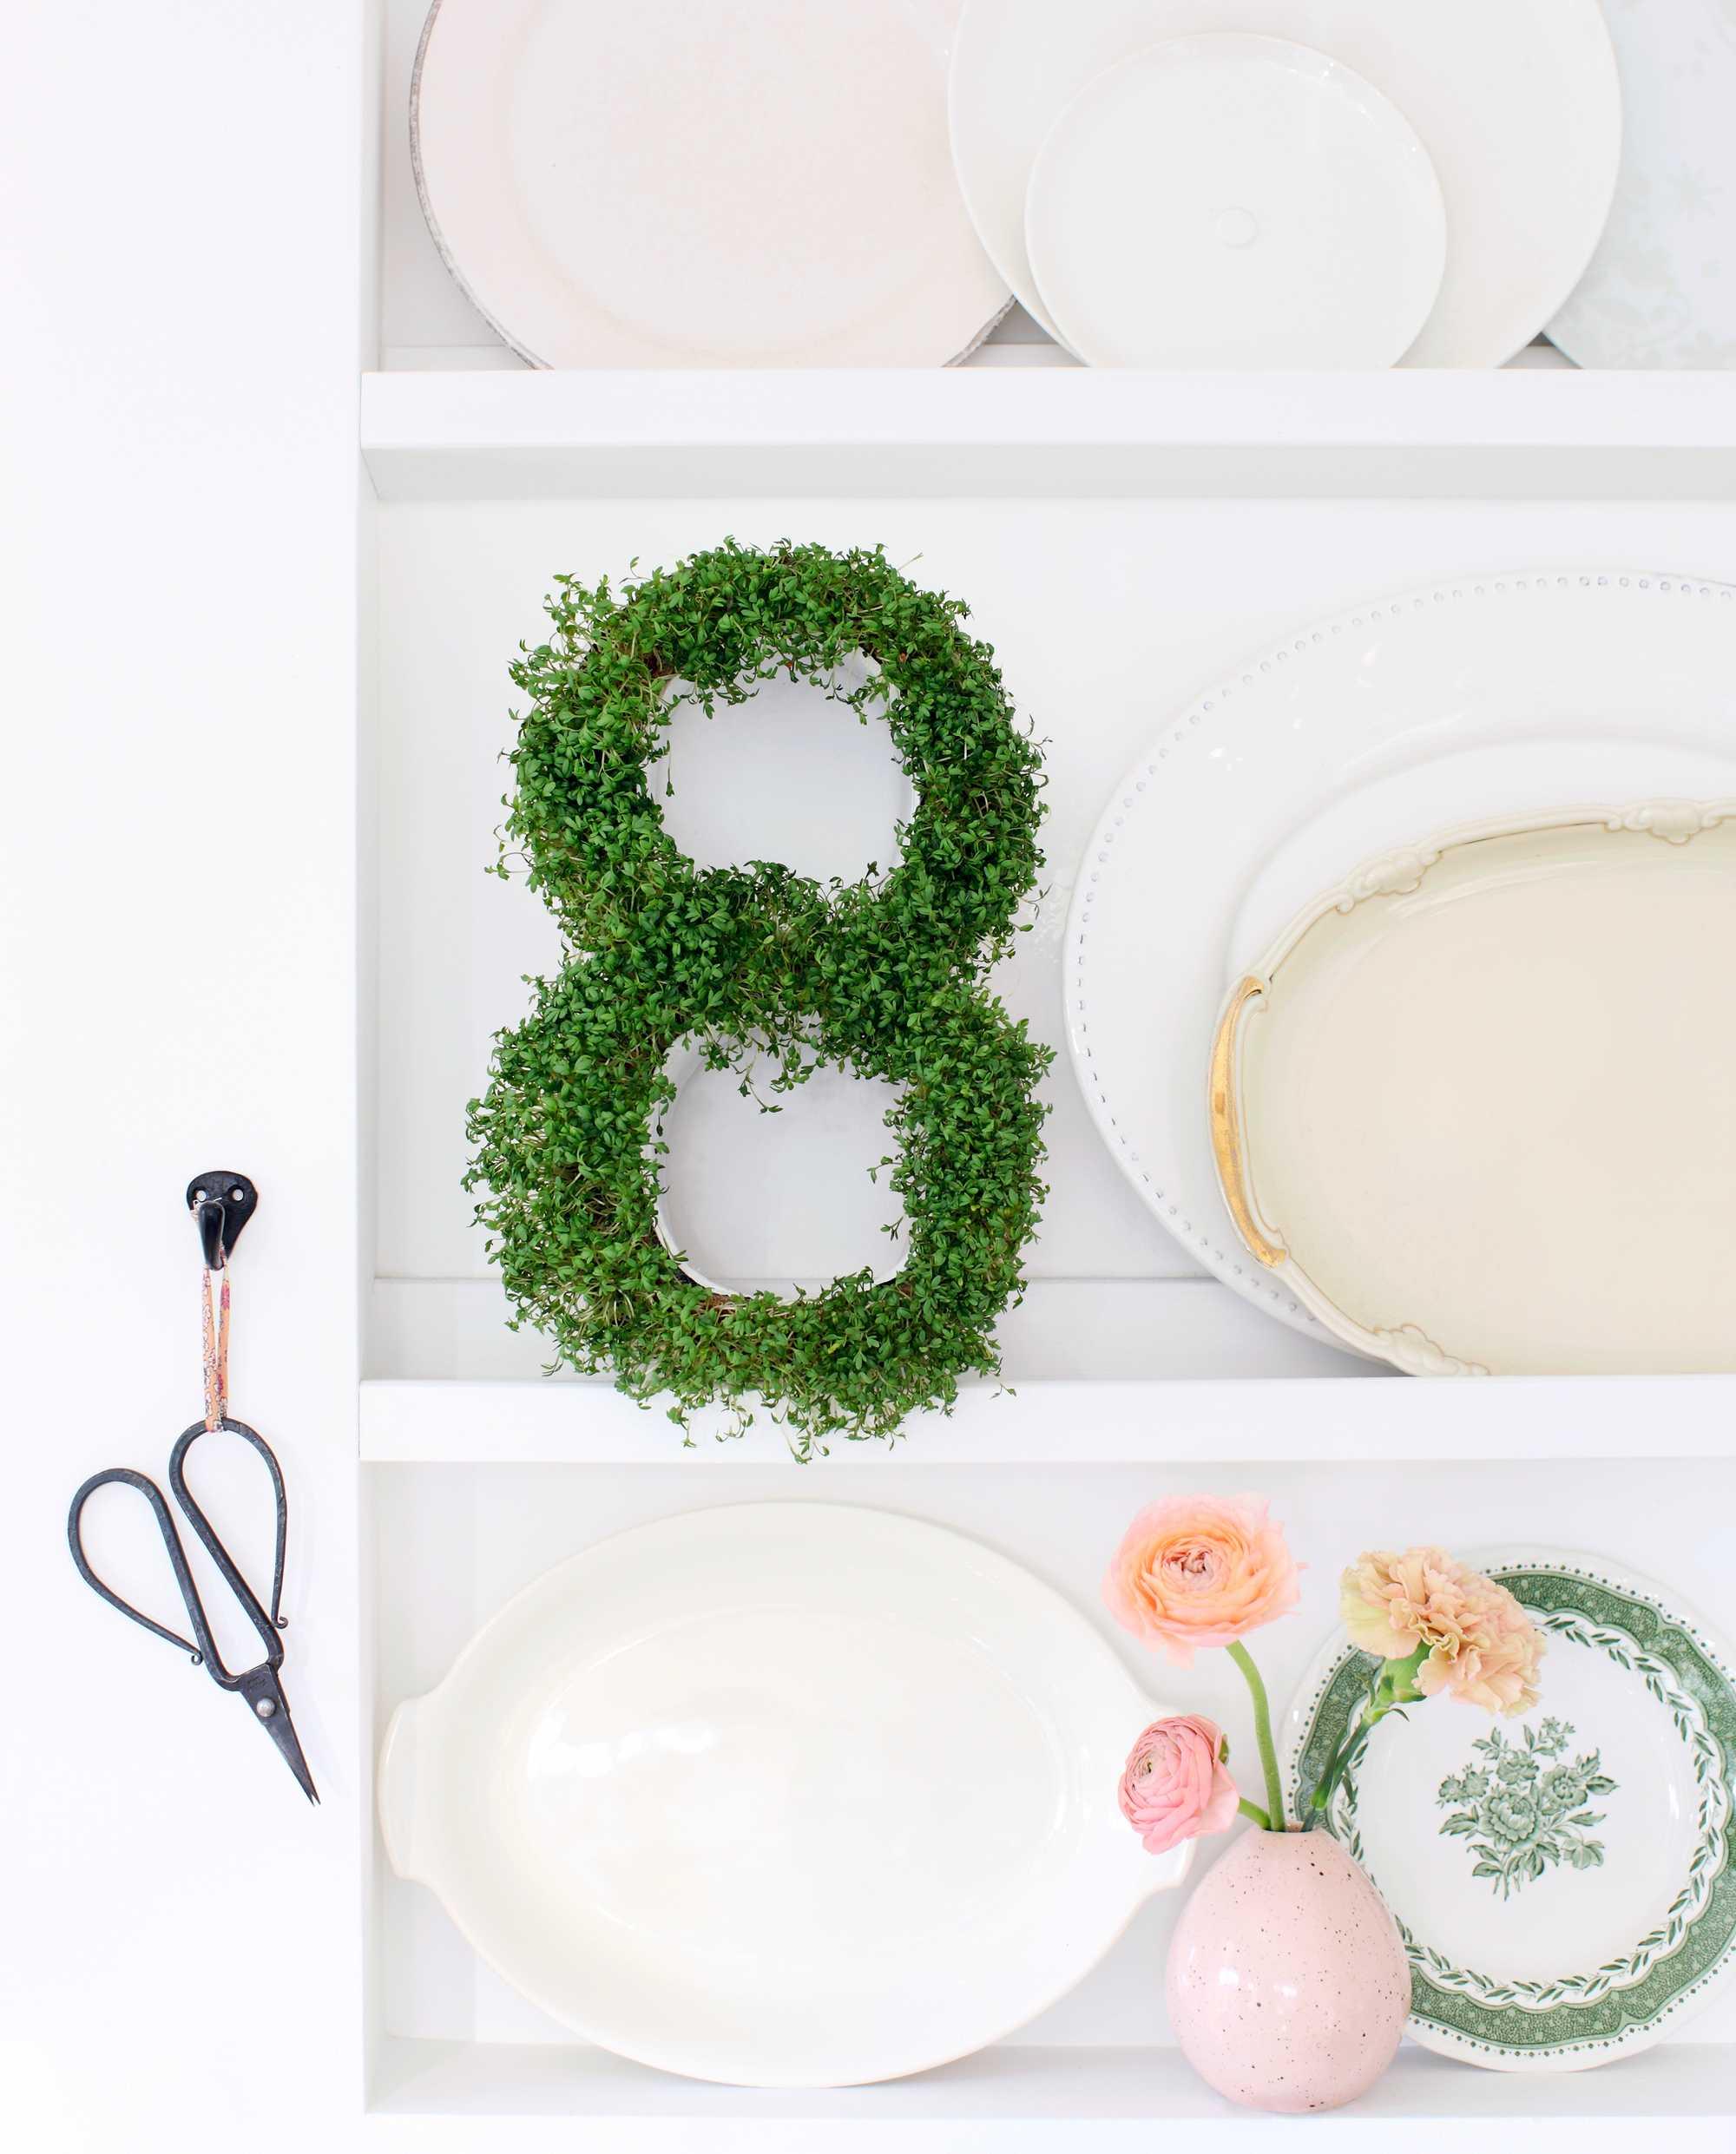 groen keuken kruiden diy